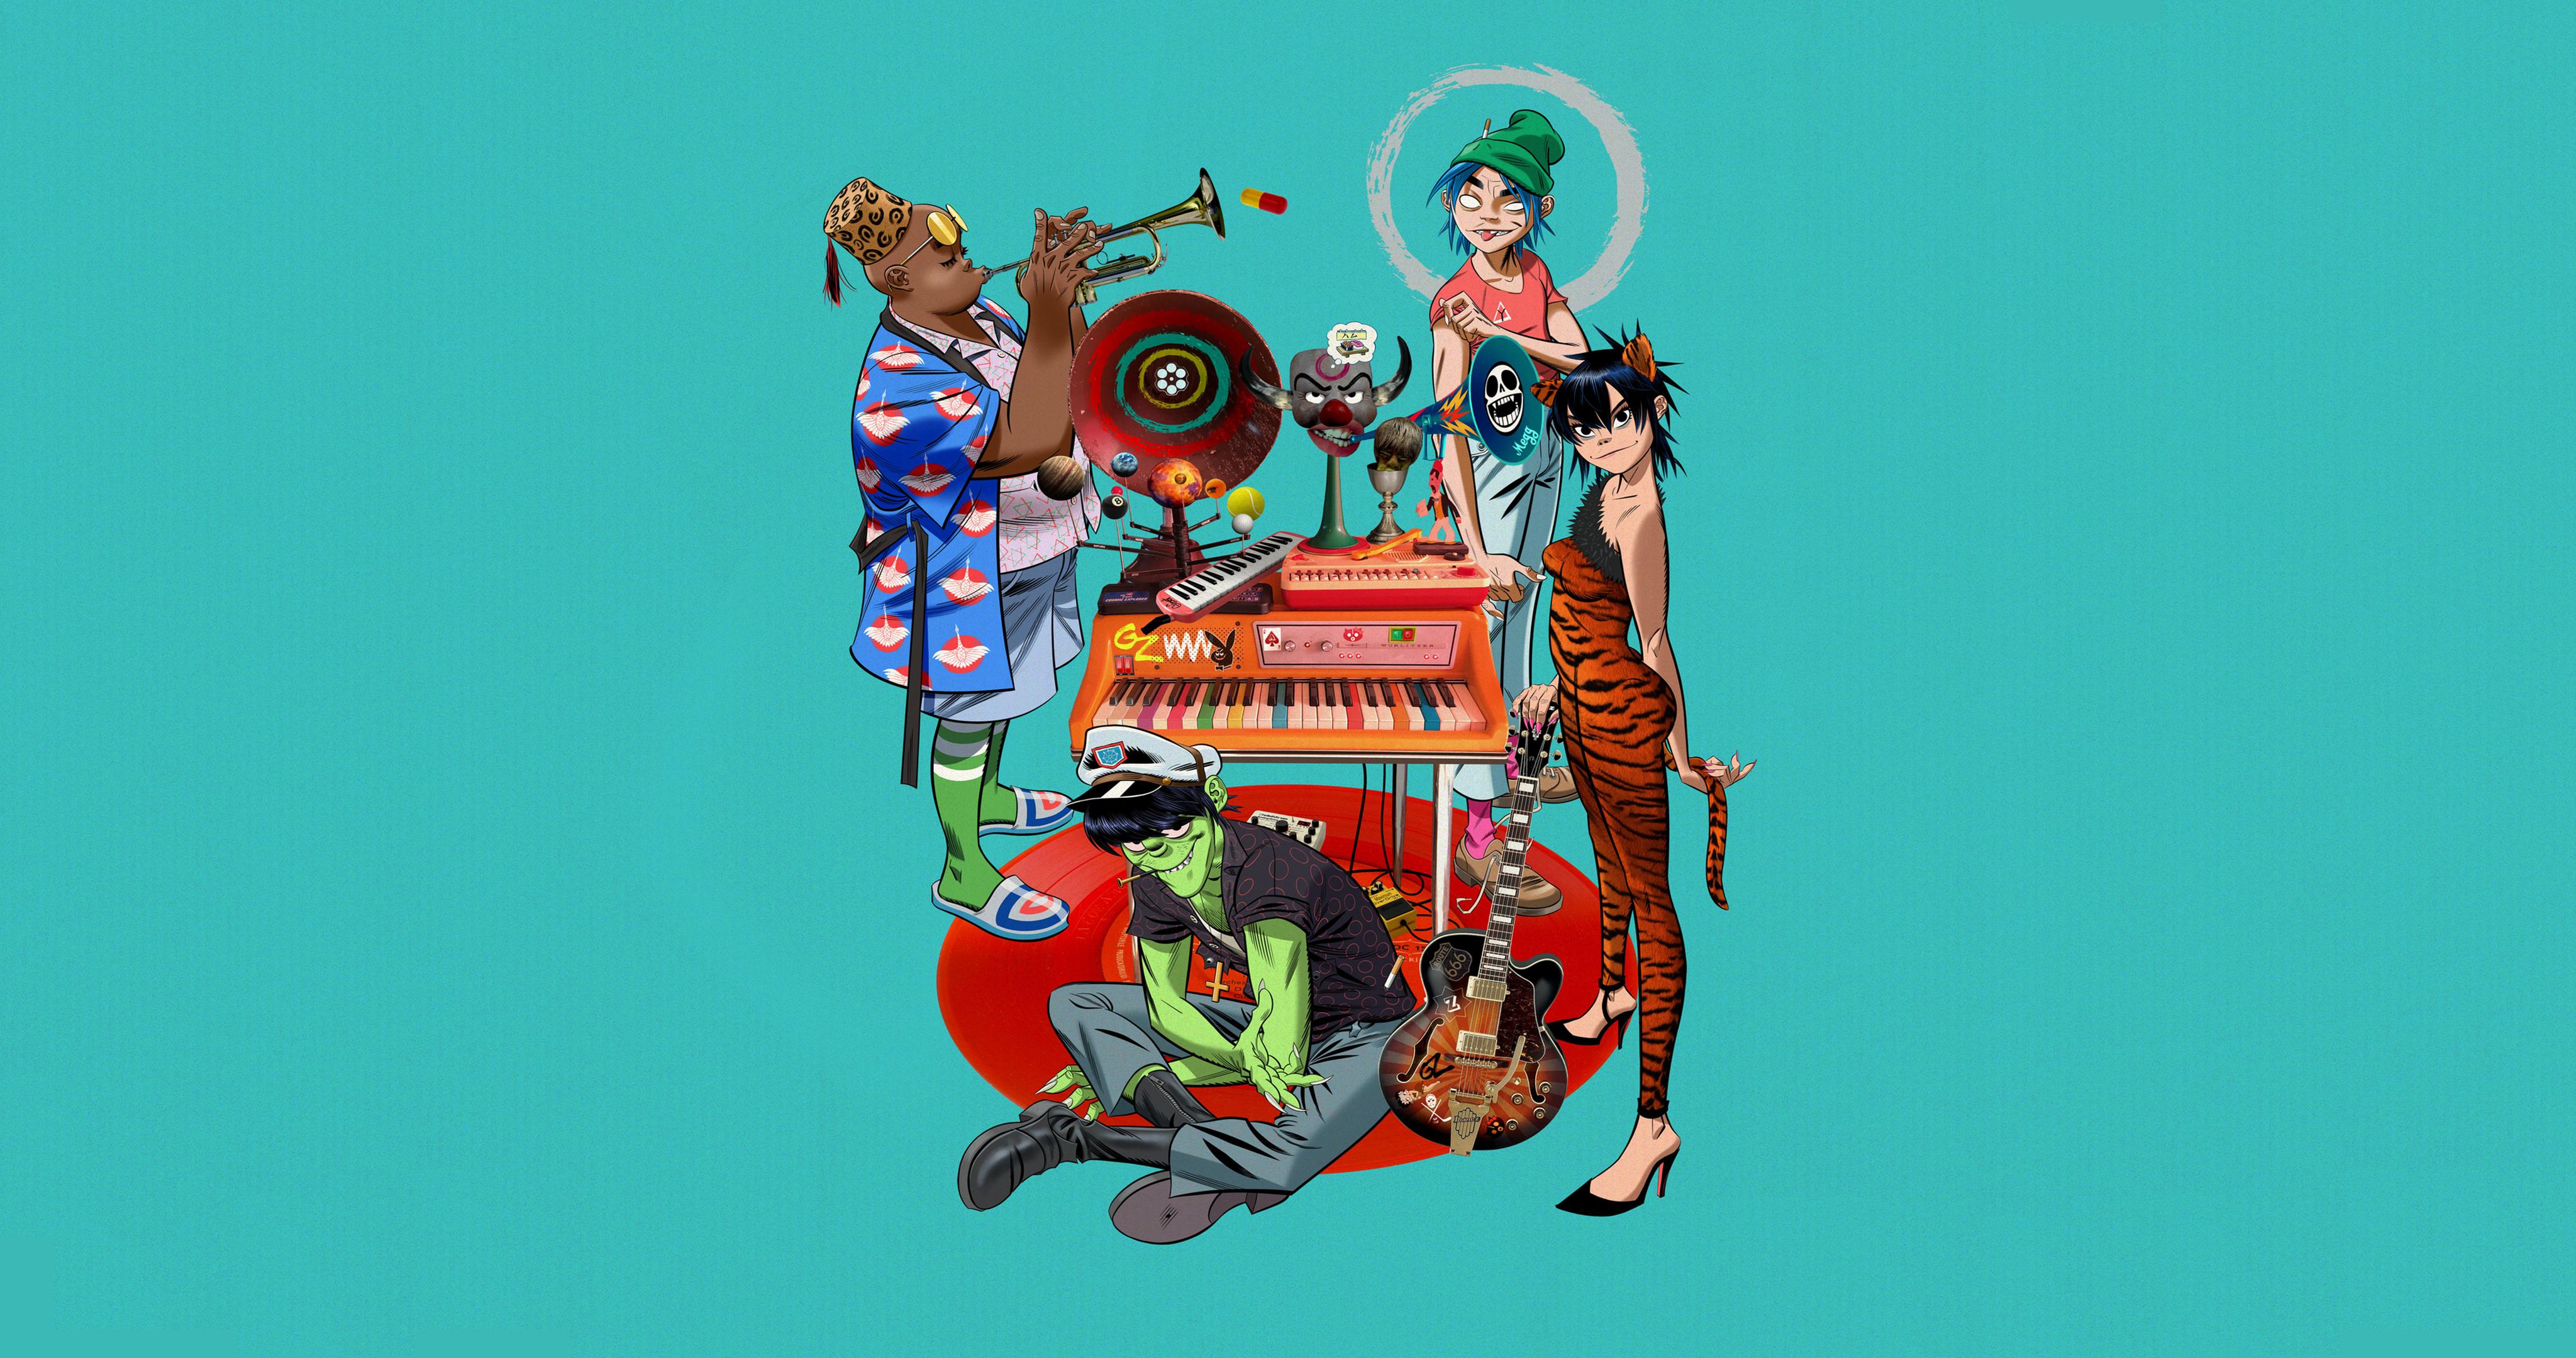 Song Machine By Gorillaz 4096x2160 In 2020 Gorillaz Gorillaz Art Wallpaper